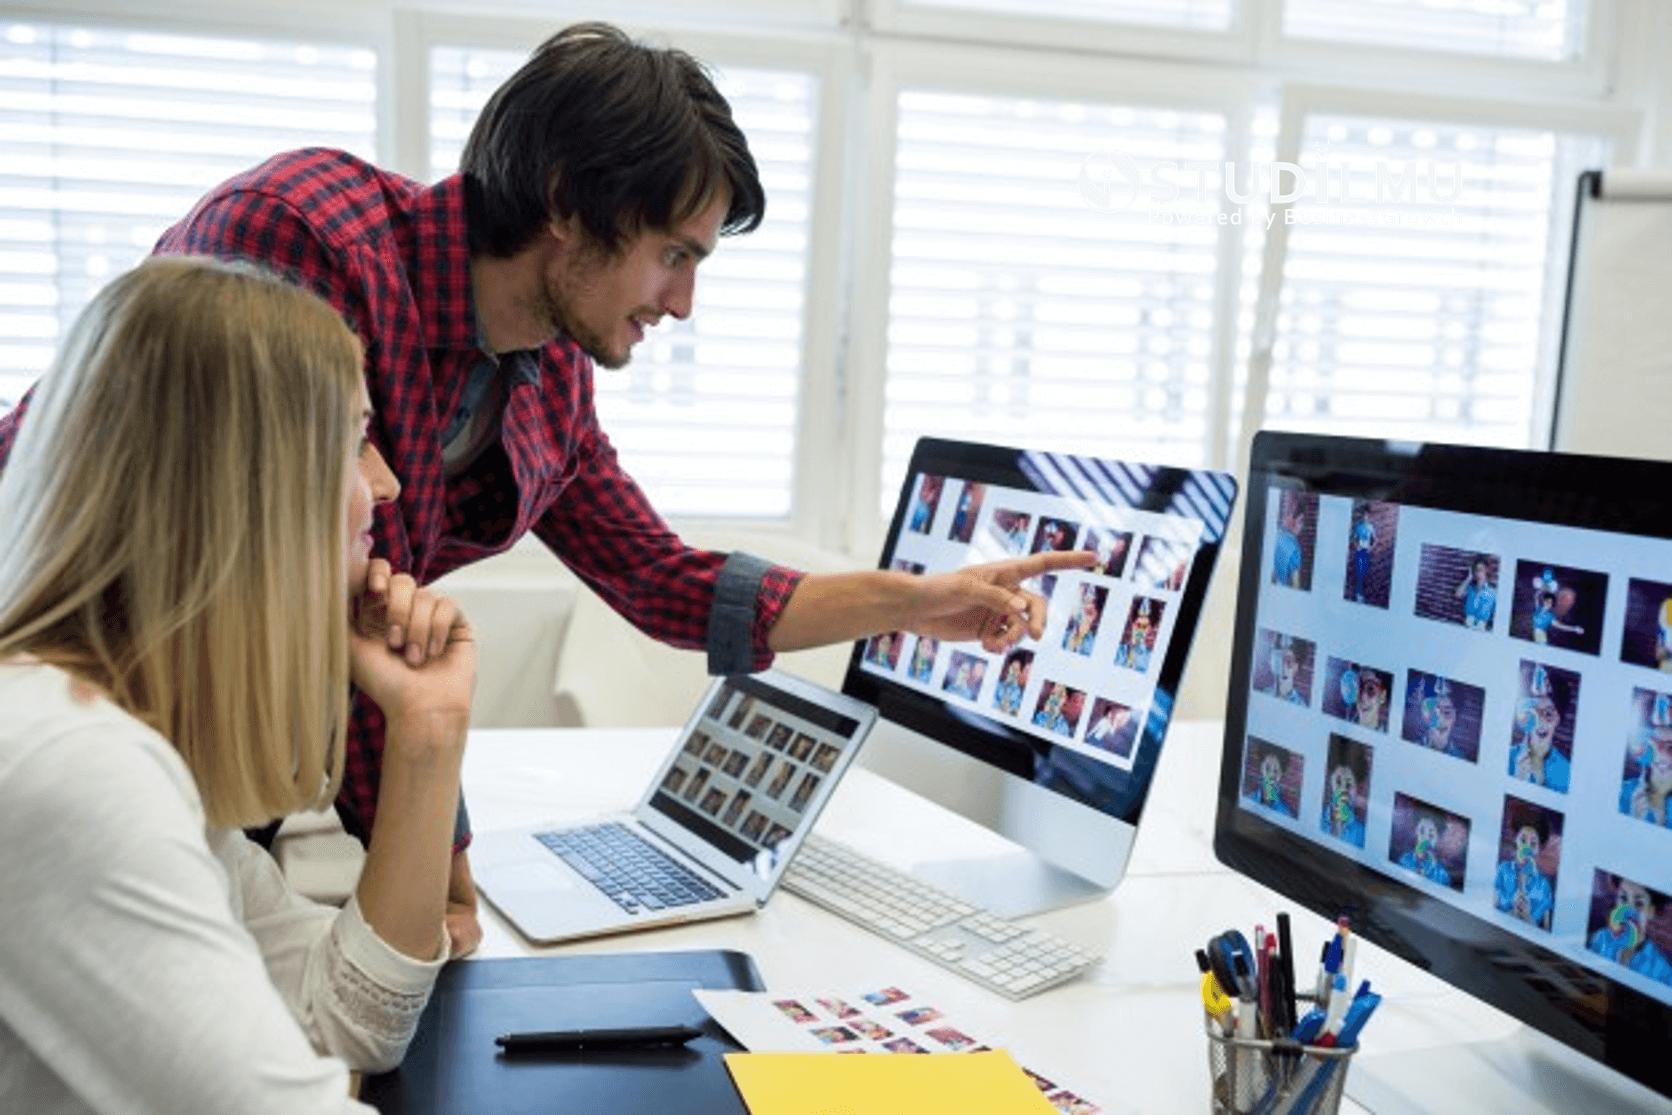 STUDILMU Career Advice - 6 Keterampilan Komunikasi yang Harus Dikembangkan Para Pengusaha